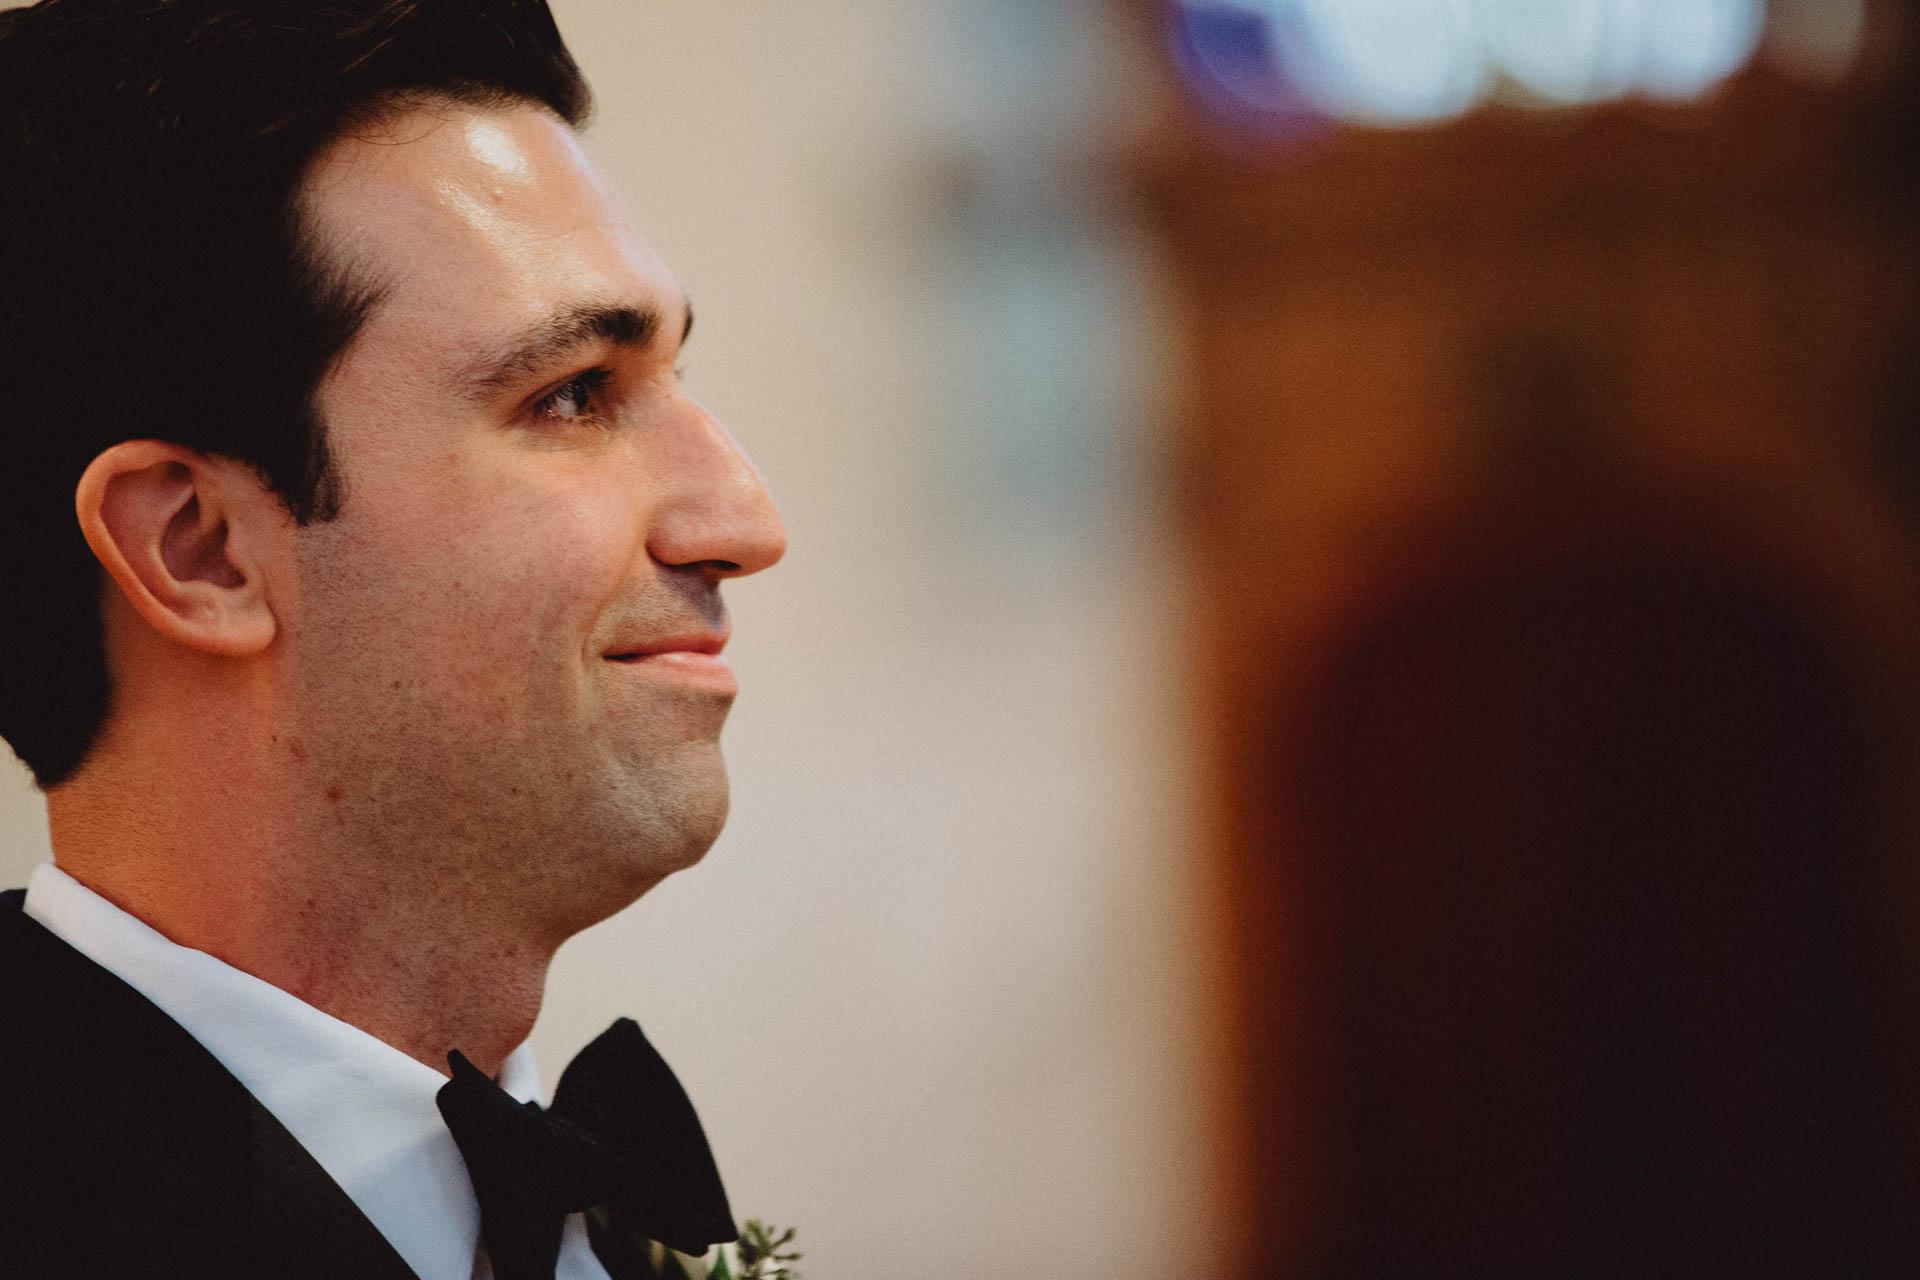 Keri-Joseph-Top-of-the-Market-Wedding-065@2x.jpg